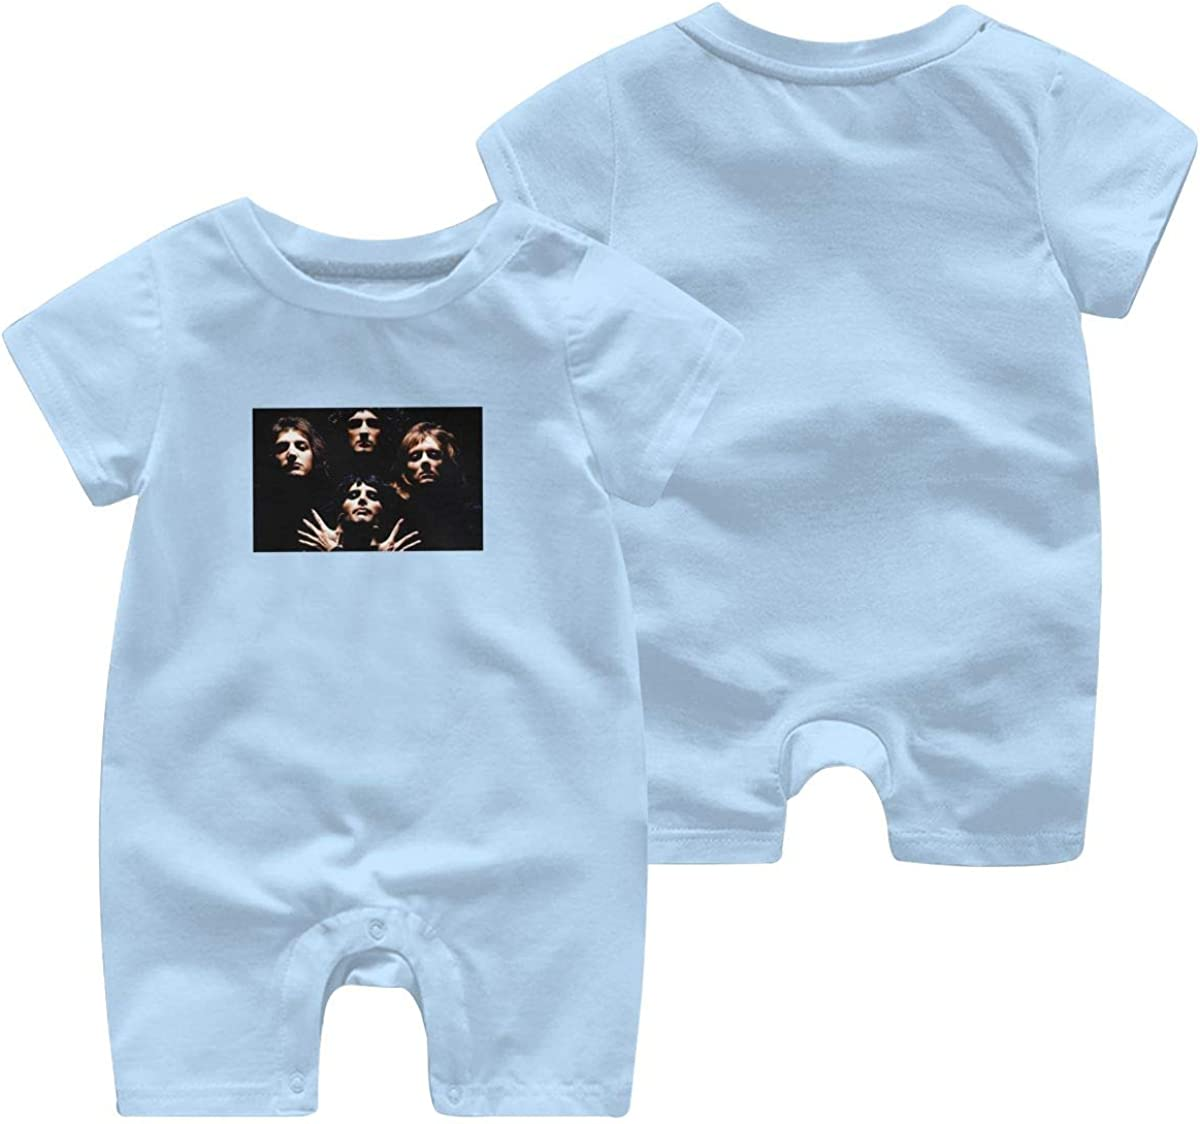 Cotton Newborn Cute Jumpsuit Queen Rock Band Print Design Baby Onesies